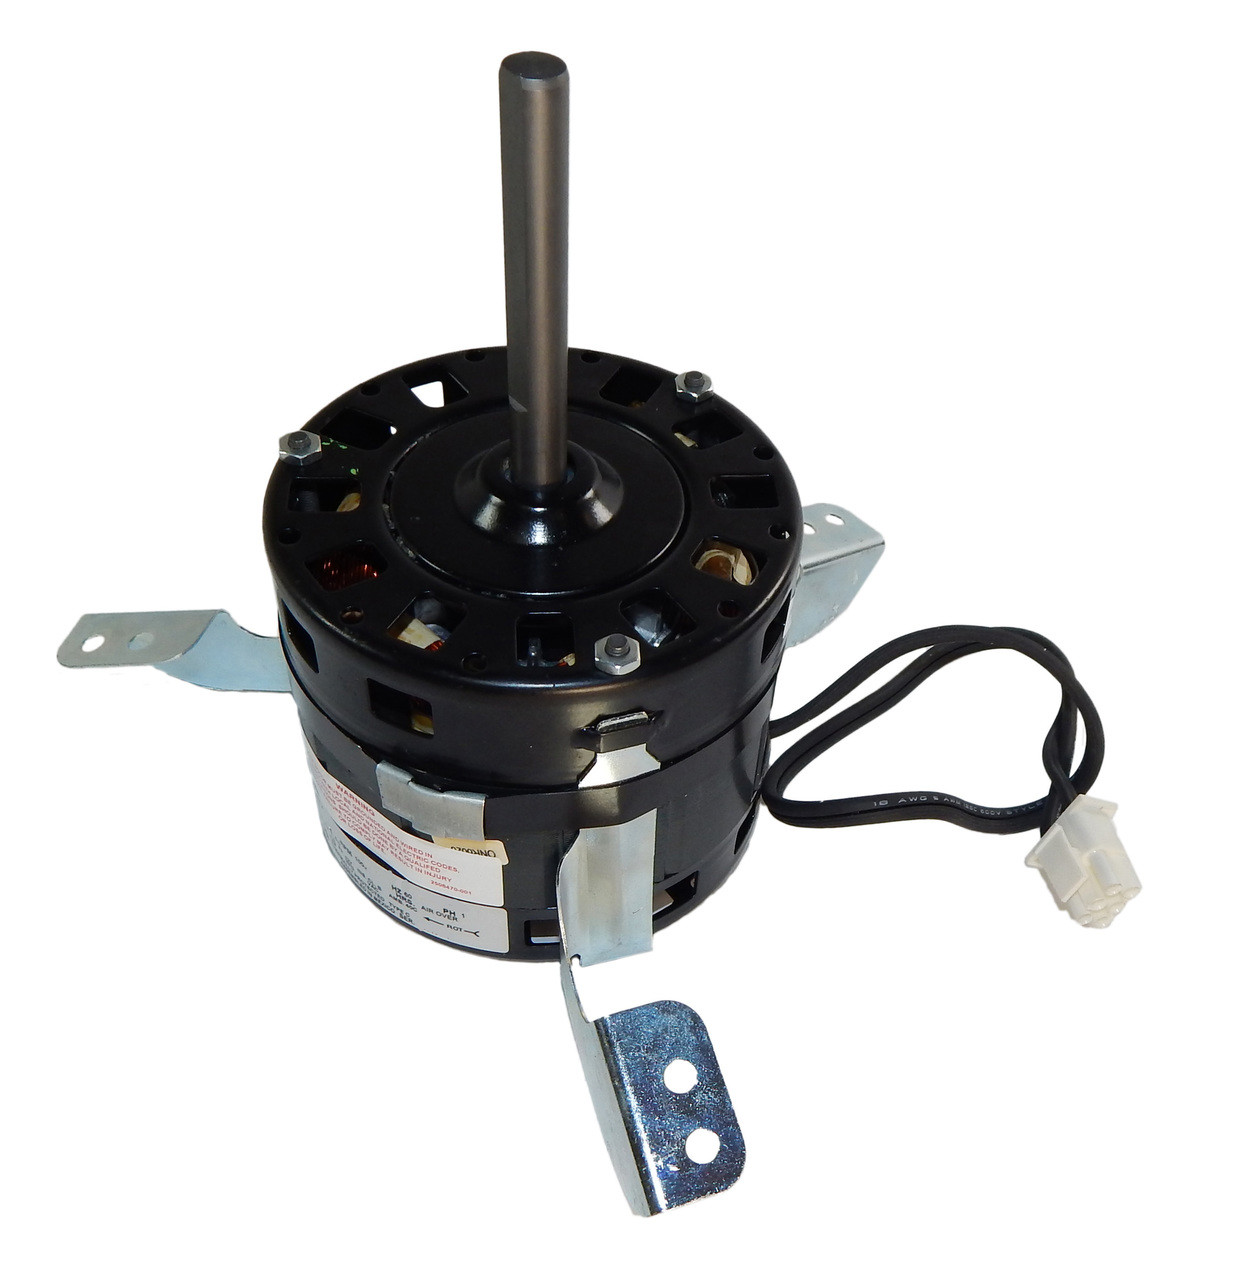 GE Genteq ECM 2.3 1 HP Blower Motor 5SME39SL0047 HD52AE134